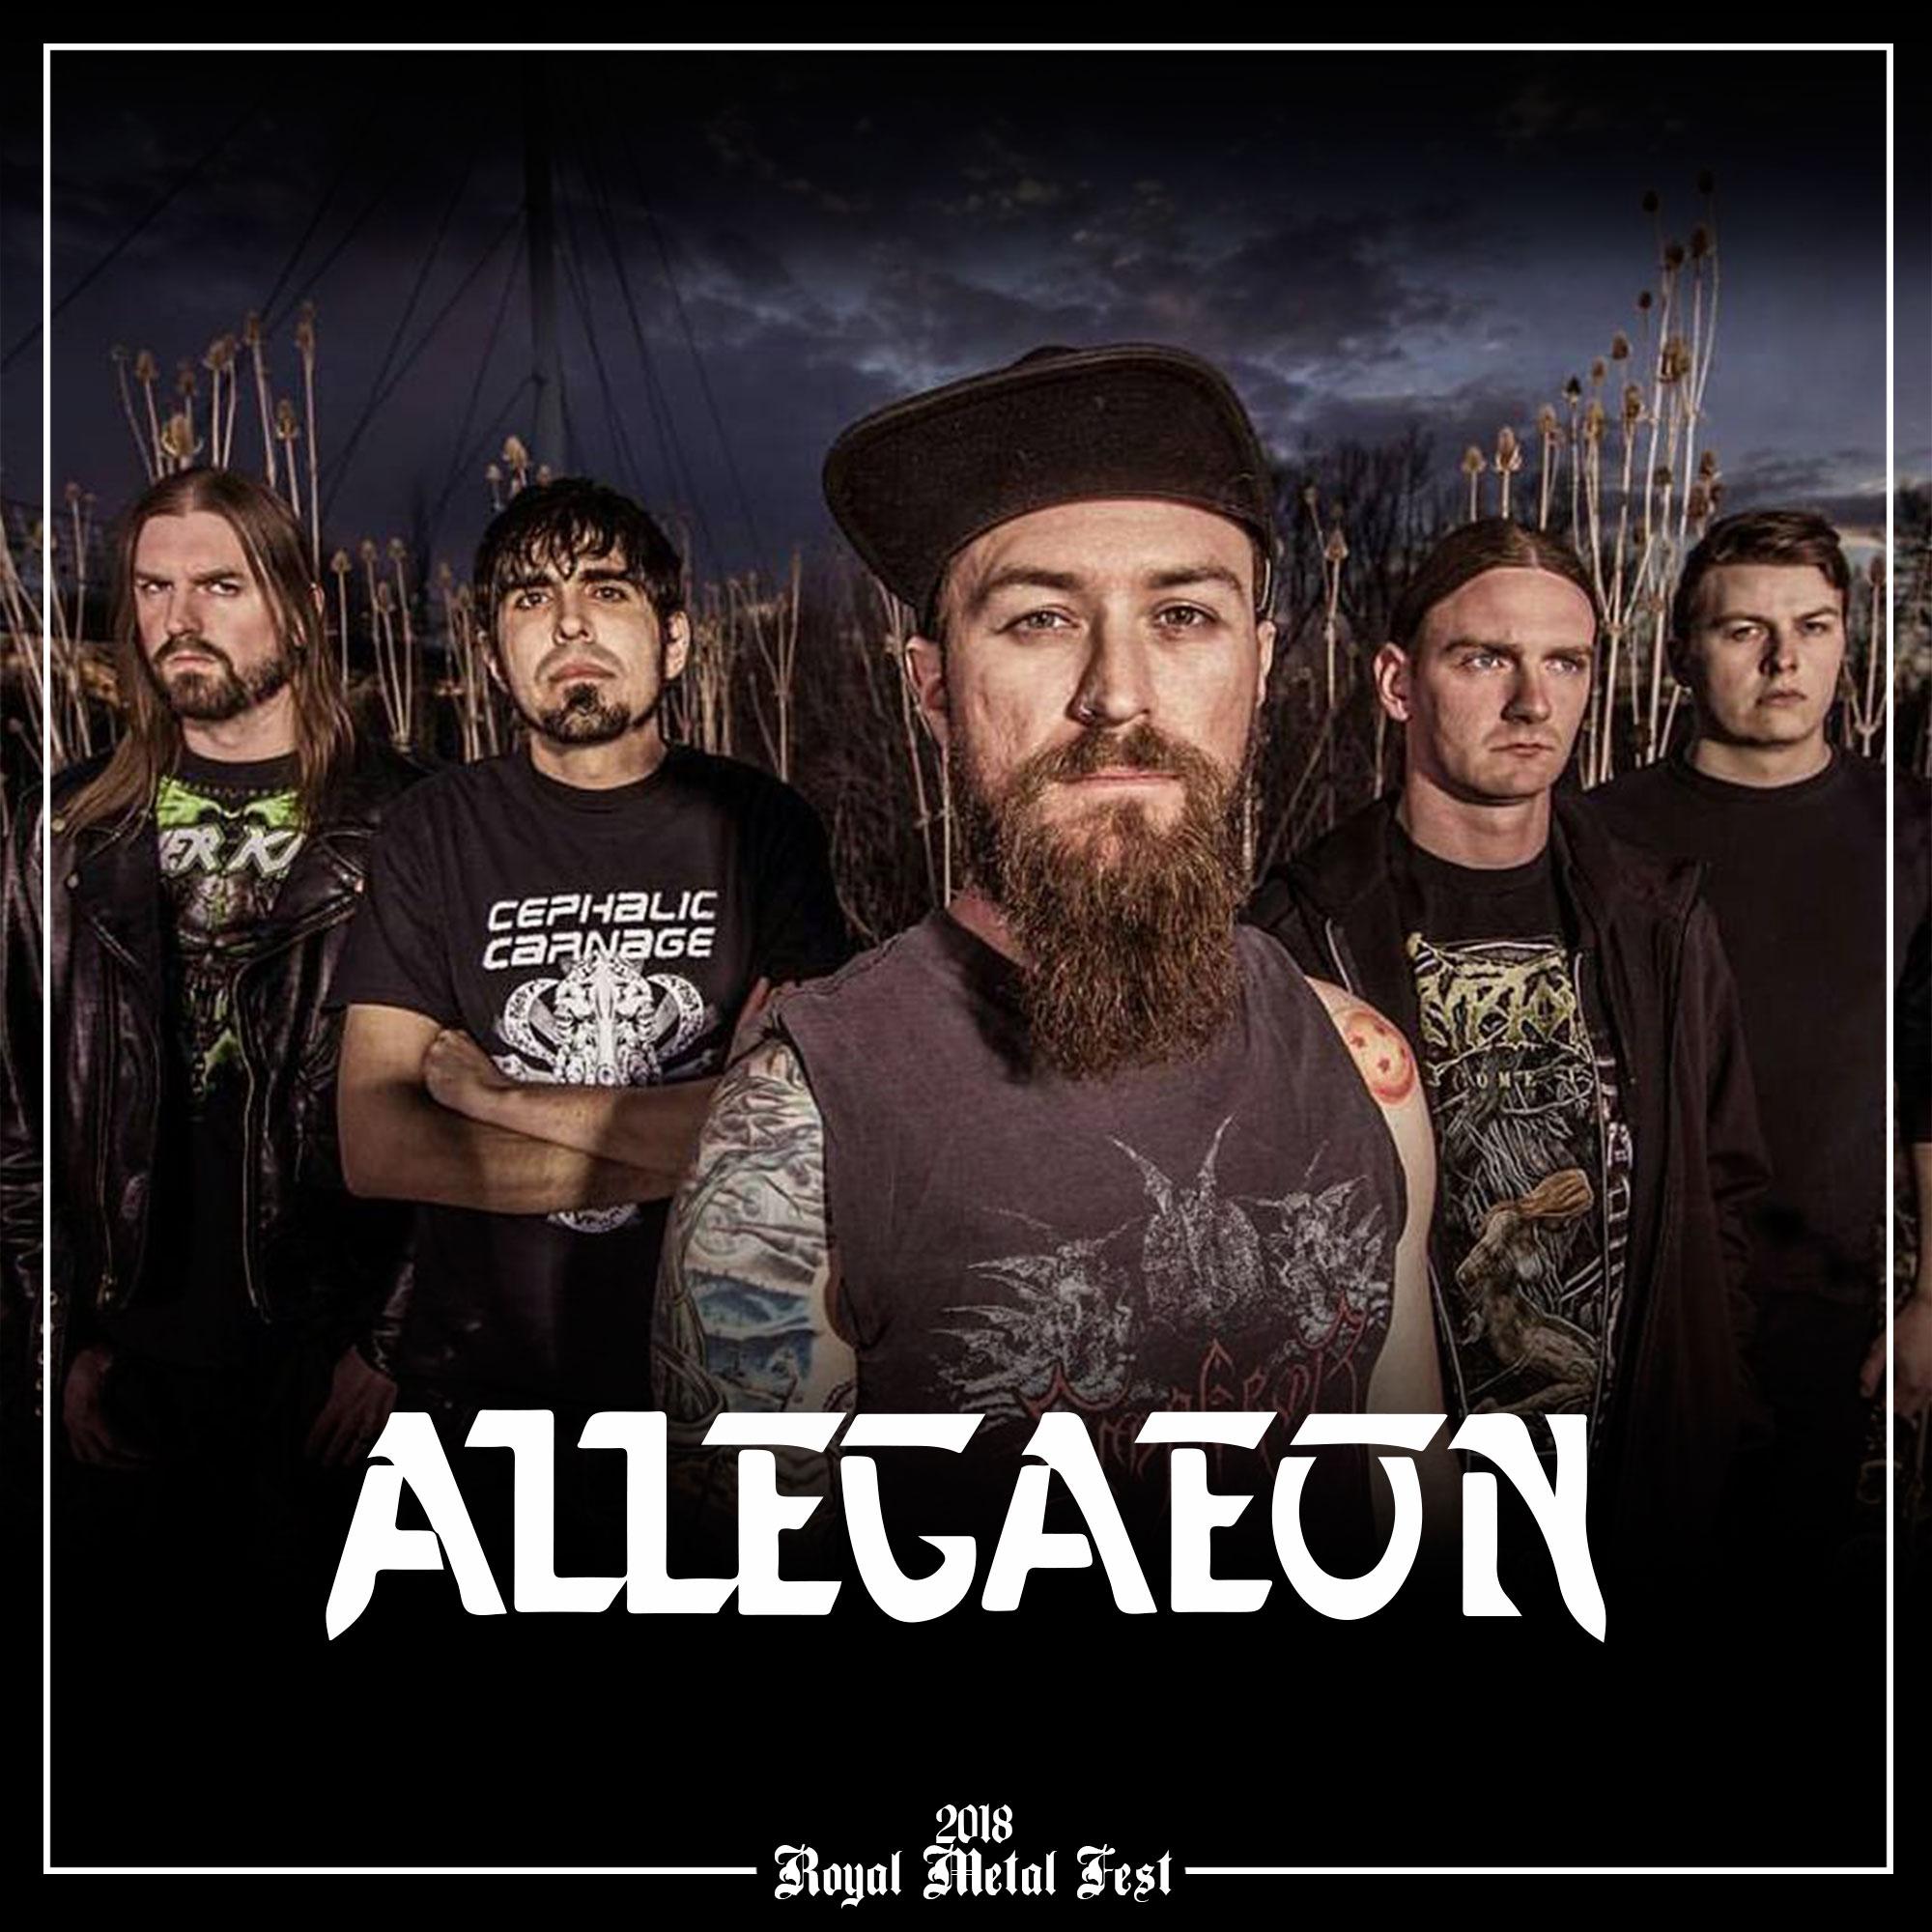 Allegaeon (US)